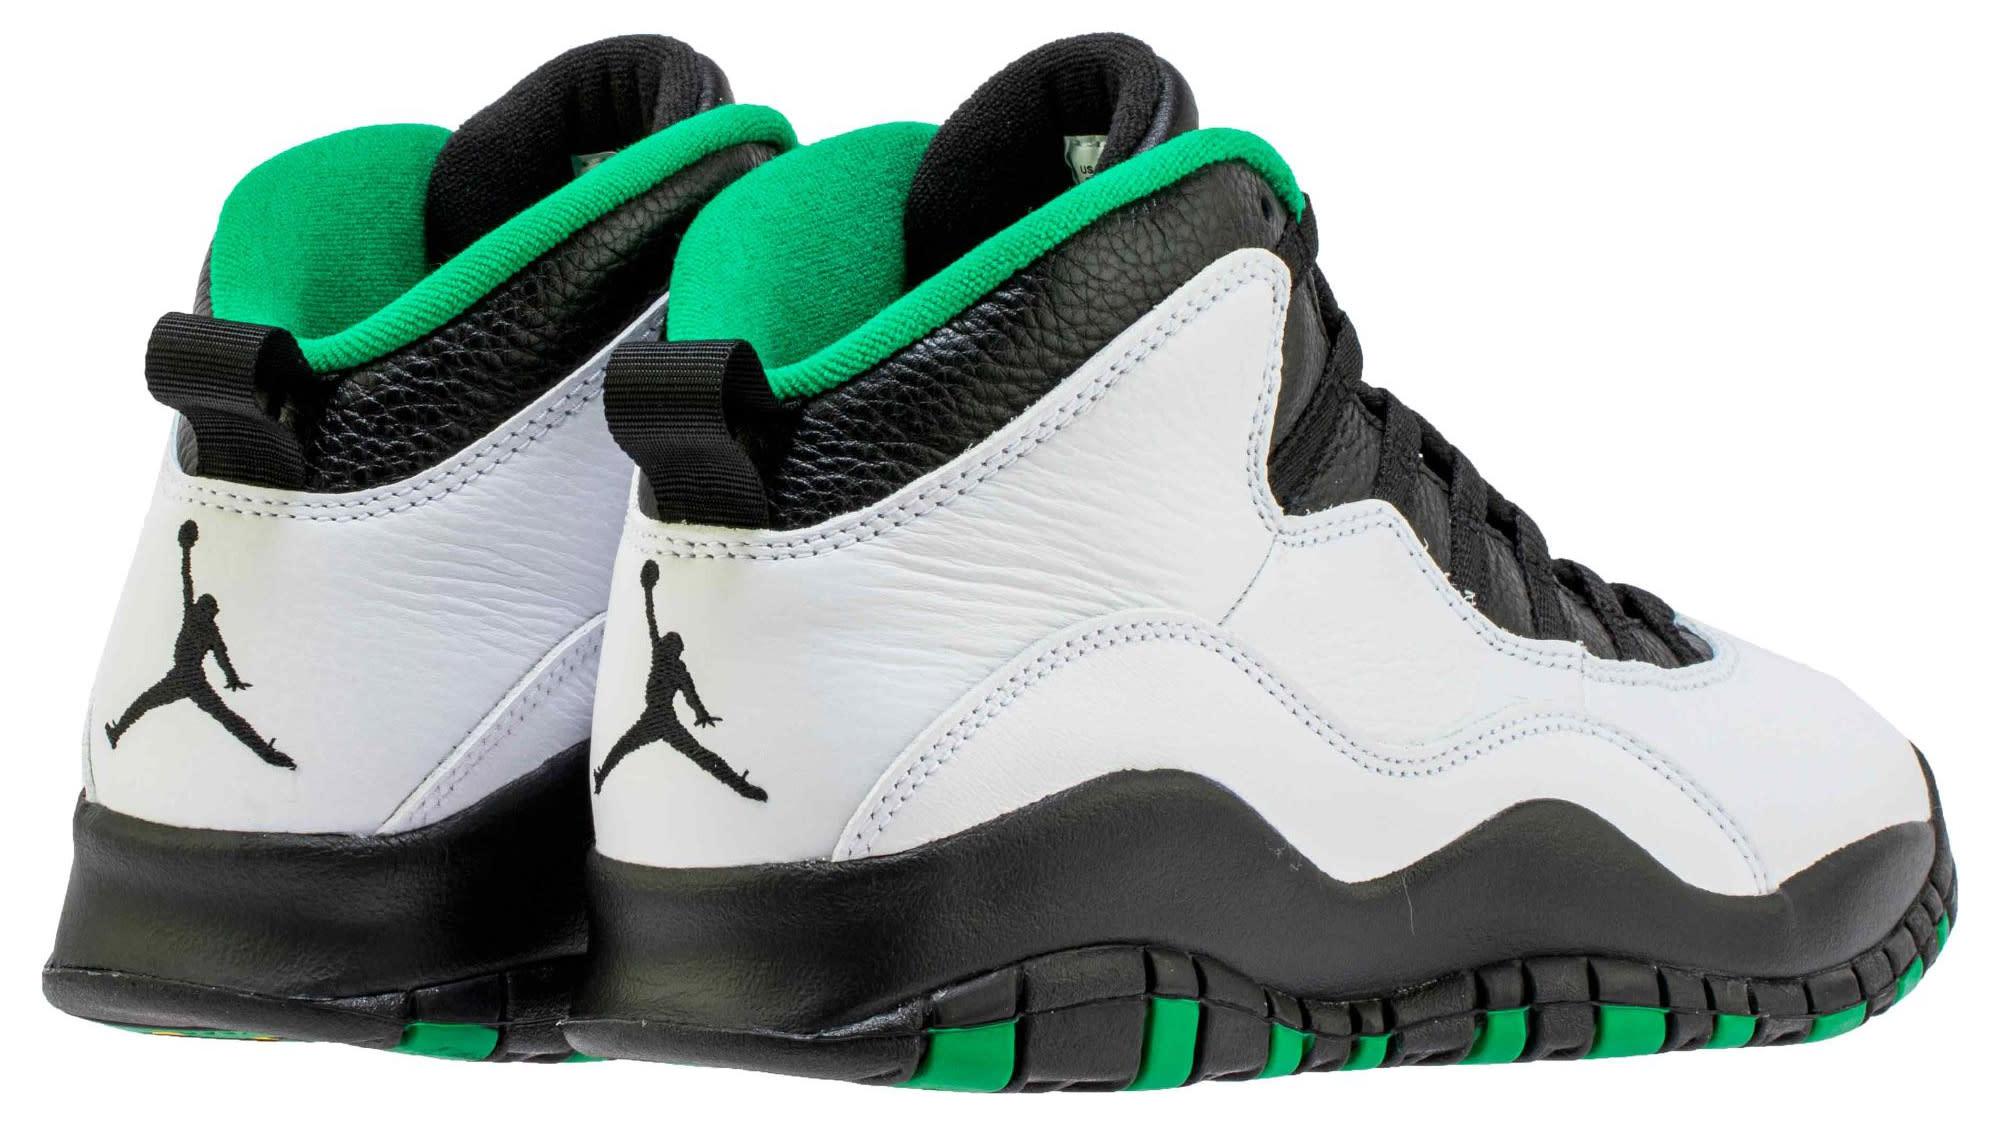 Air Jordan 10 Seattle Release Date 310805-137 Heel